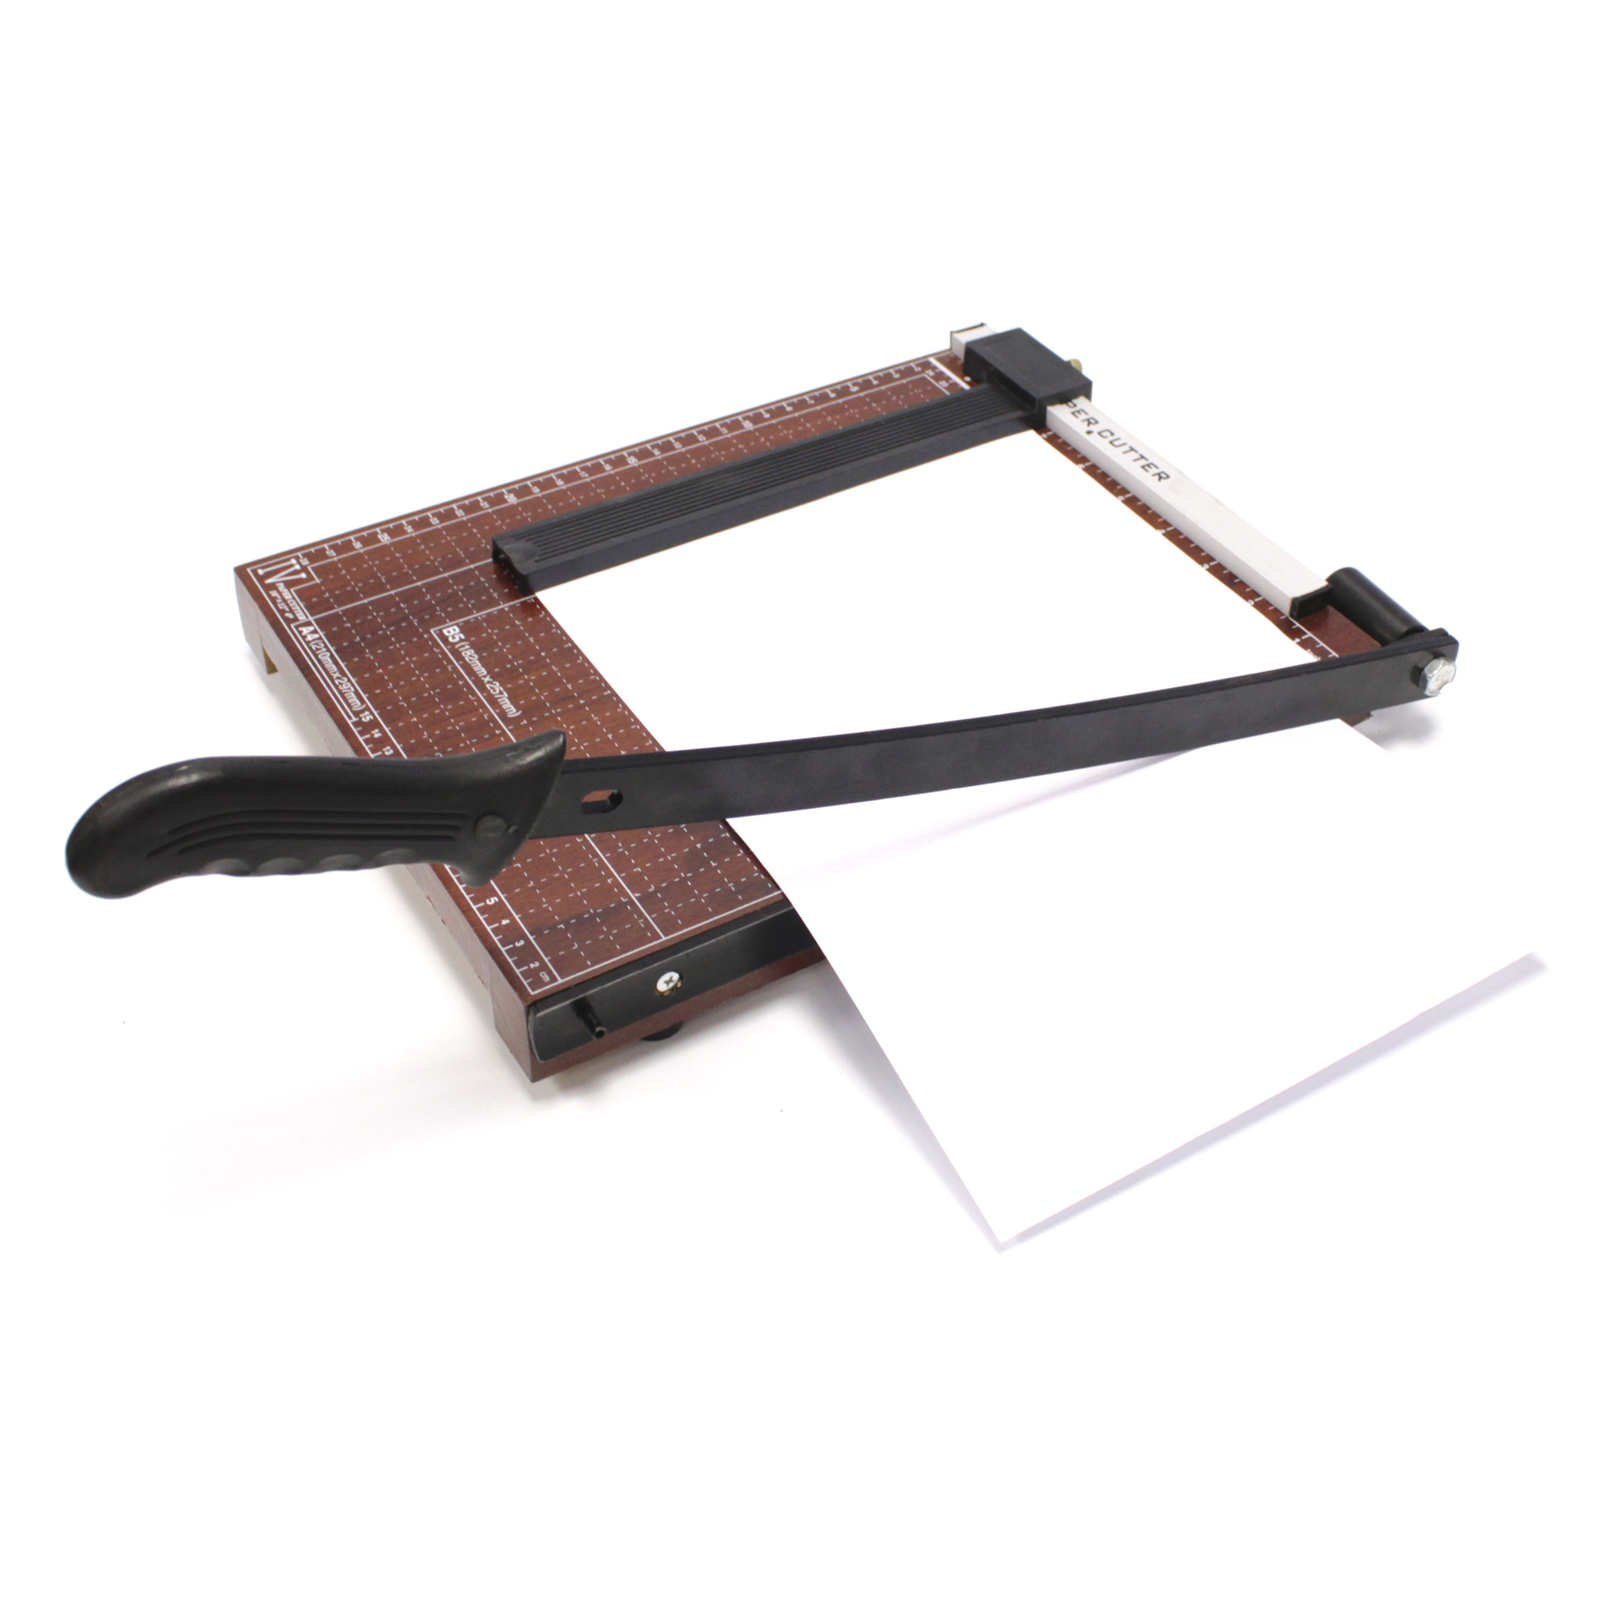 papel A4 cart/ón y papel Palanca Cortador de metal m/áquina de cortar para foto